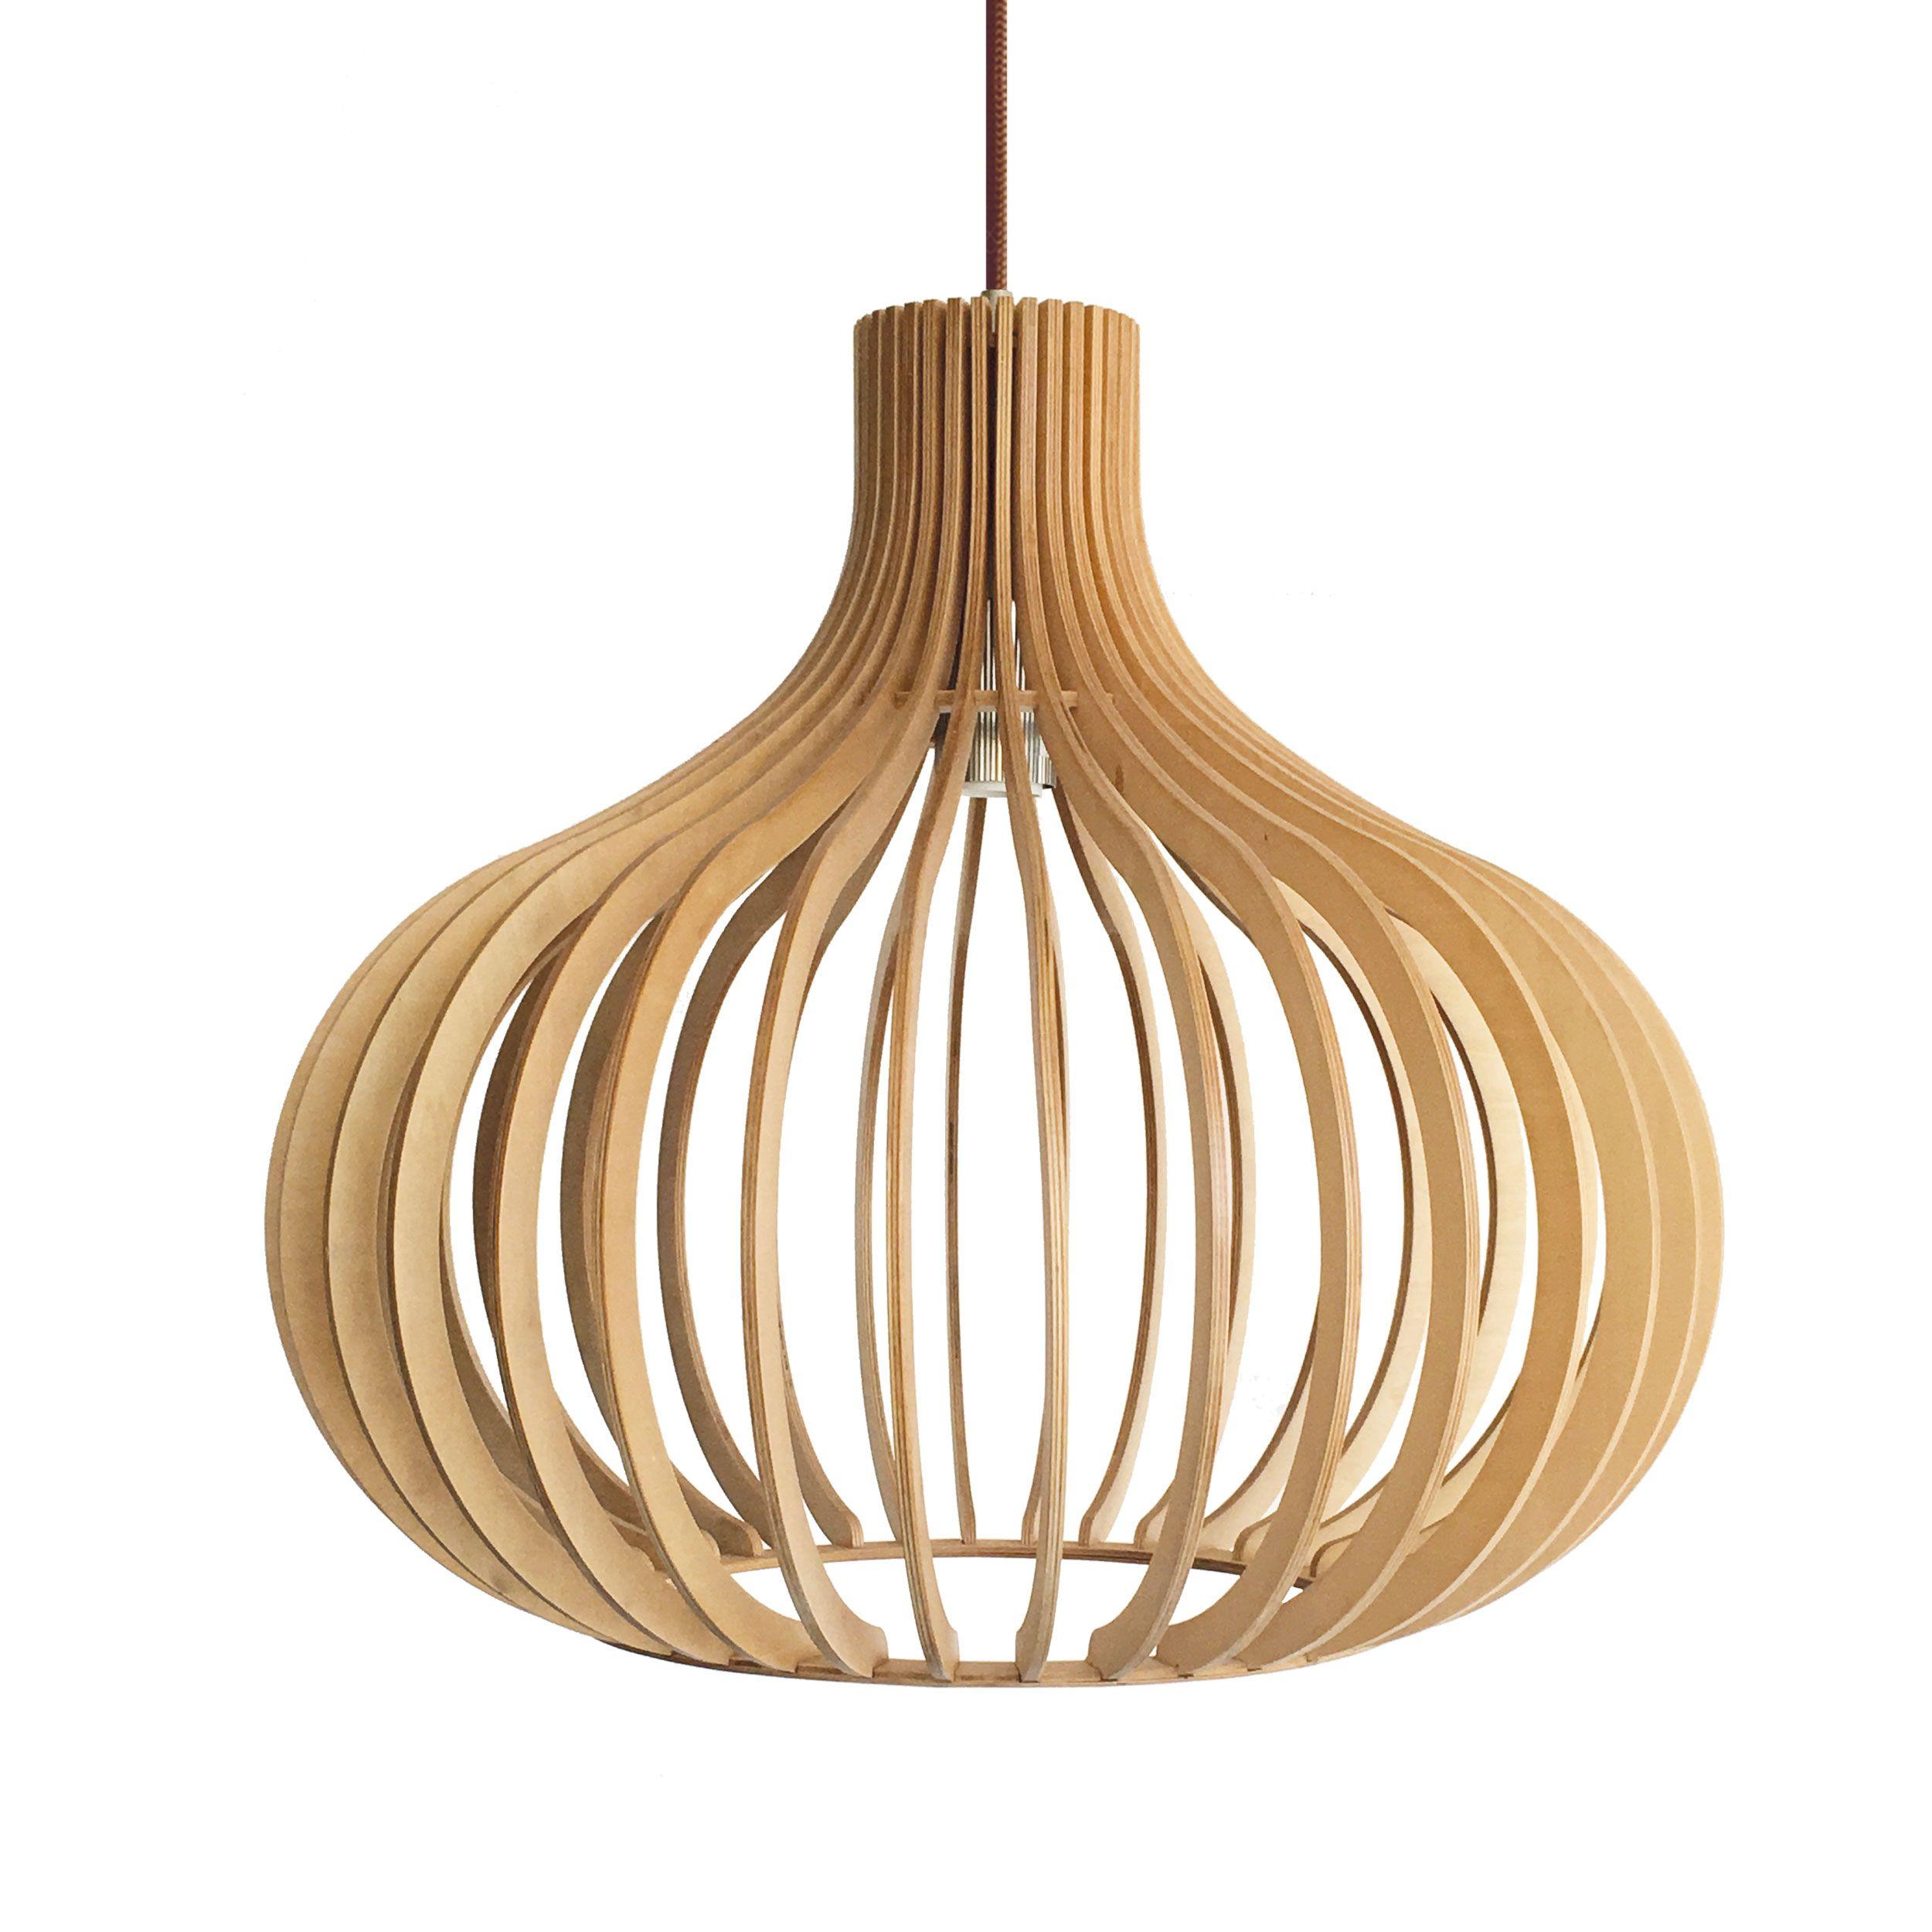 L mpara techo madera para led moderna l mparas colgantes de madera ineslam lamparas - Lamparas colgantes de madera ...